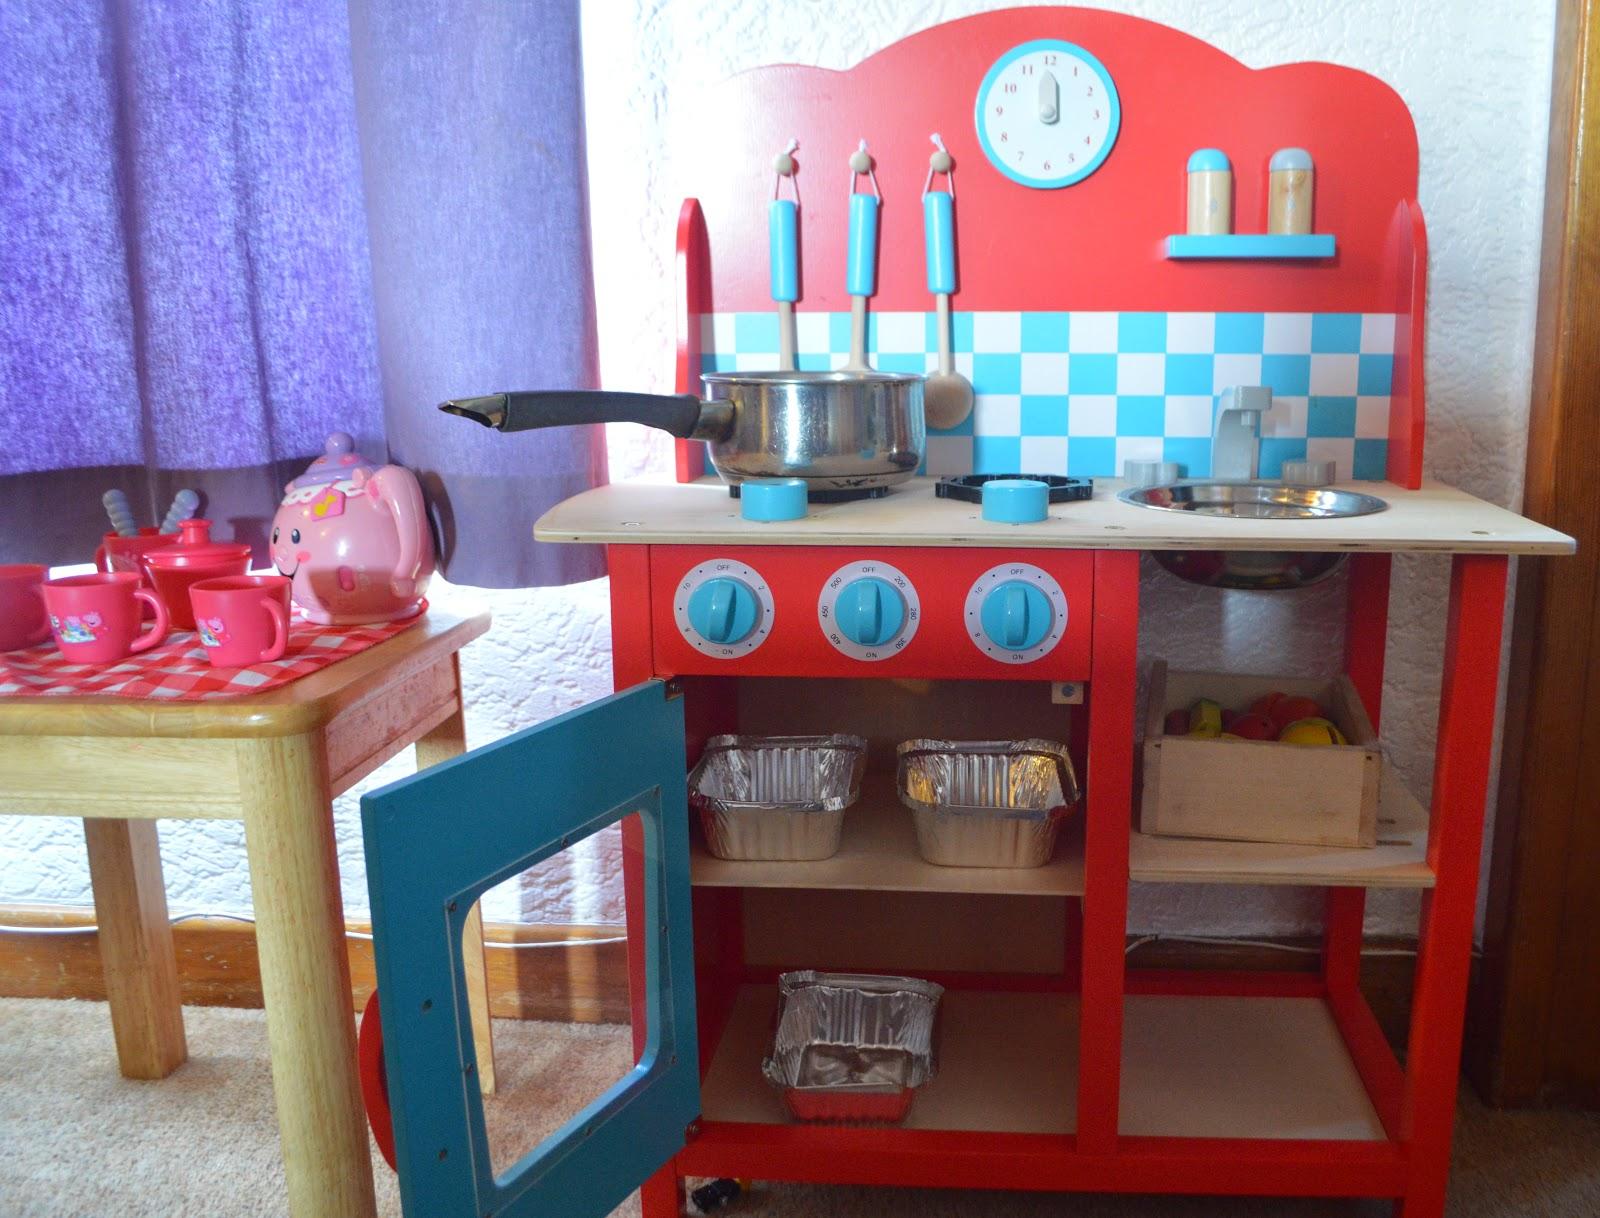 GLTC Cavendish Play kitchen Koko Kids 3 Clouds and Raindrops Wall Stickers